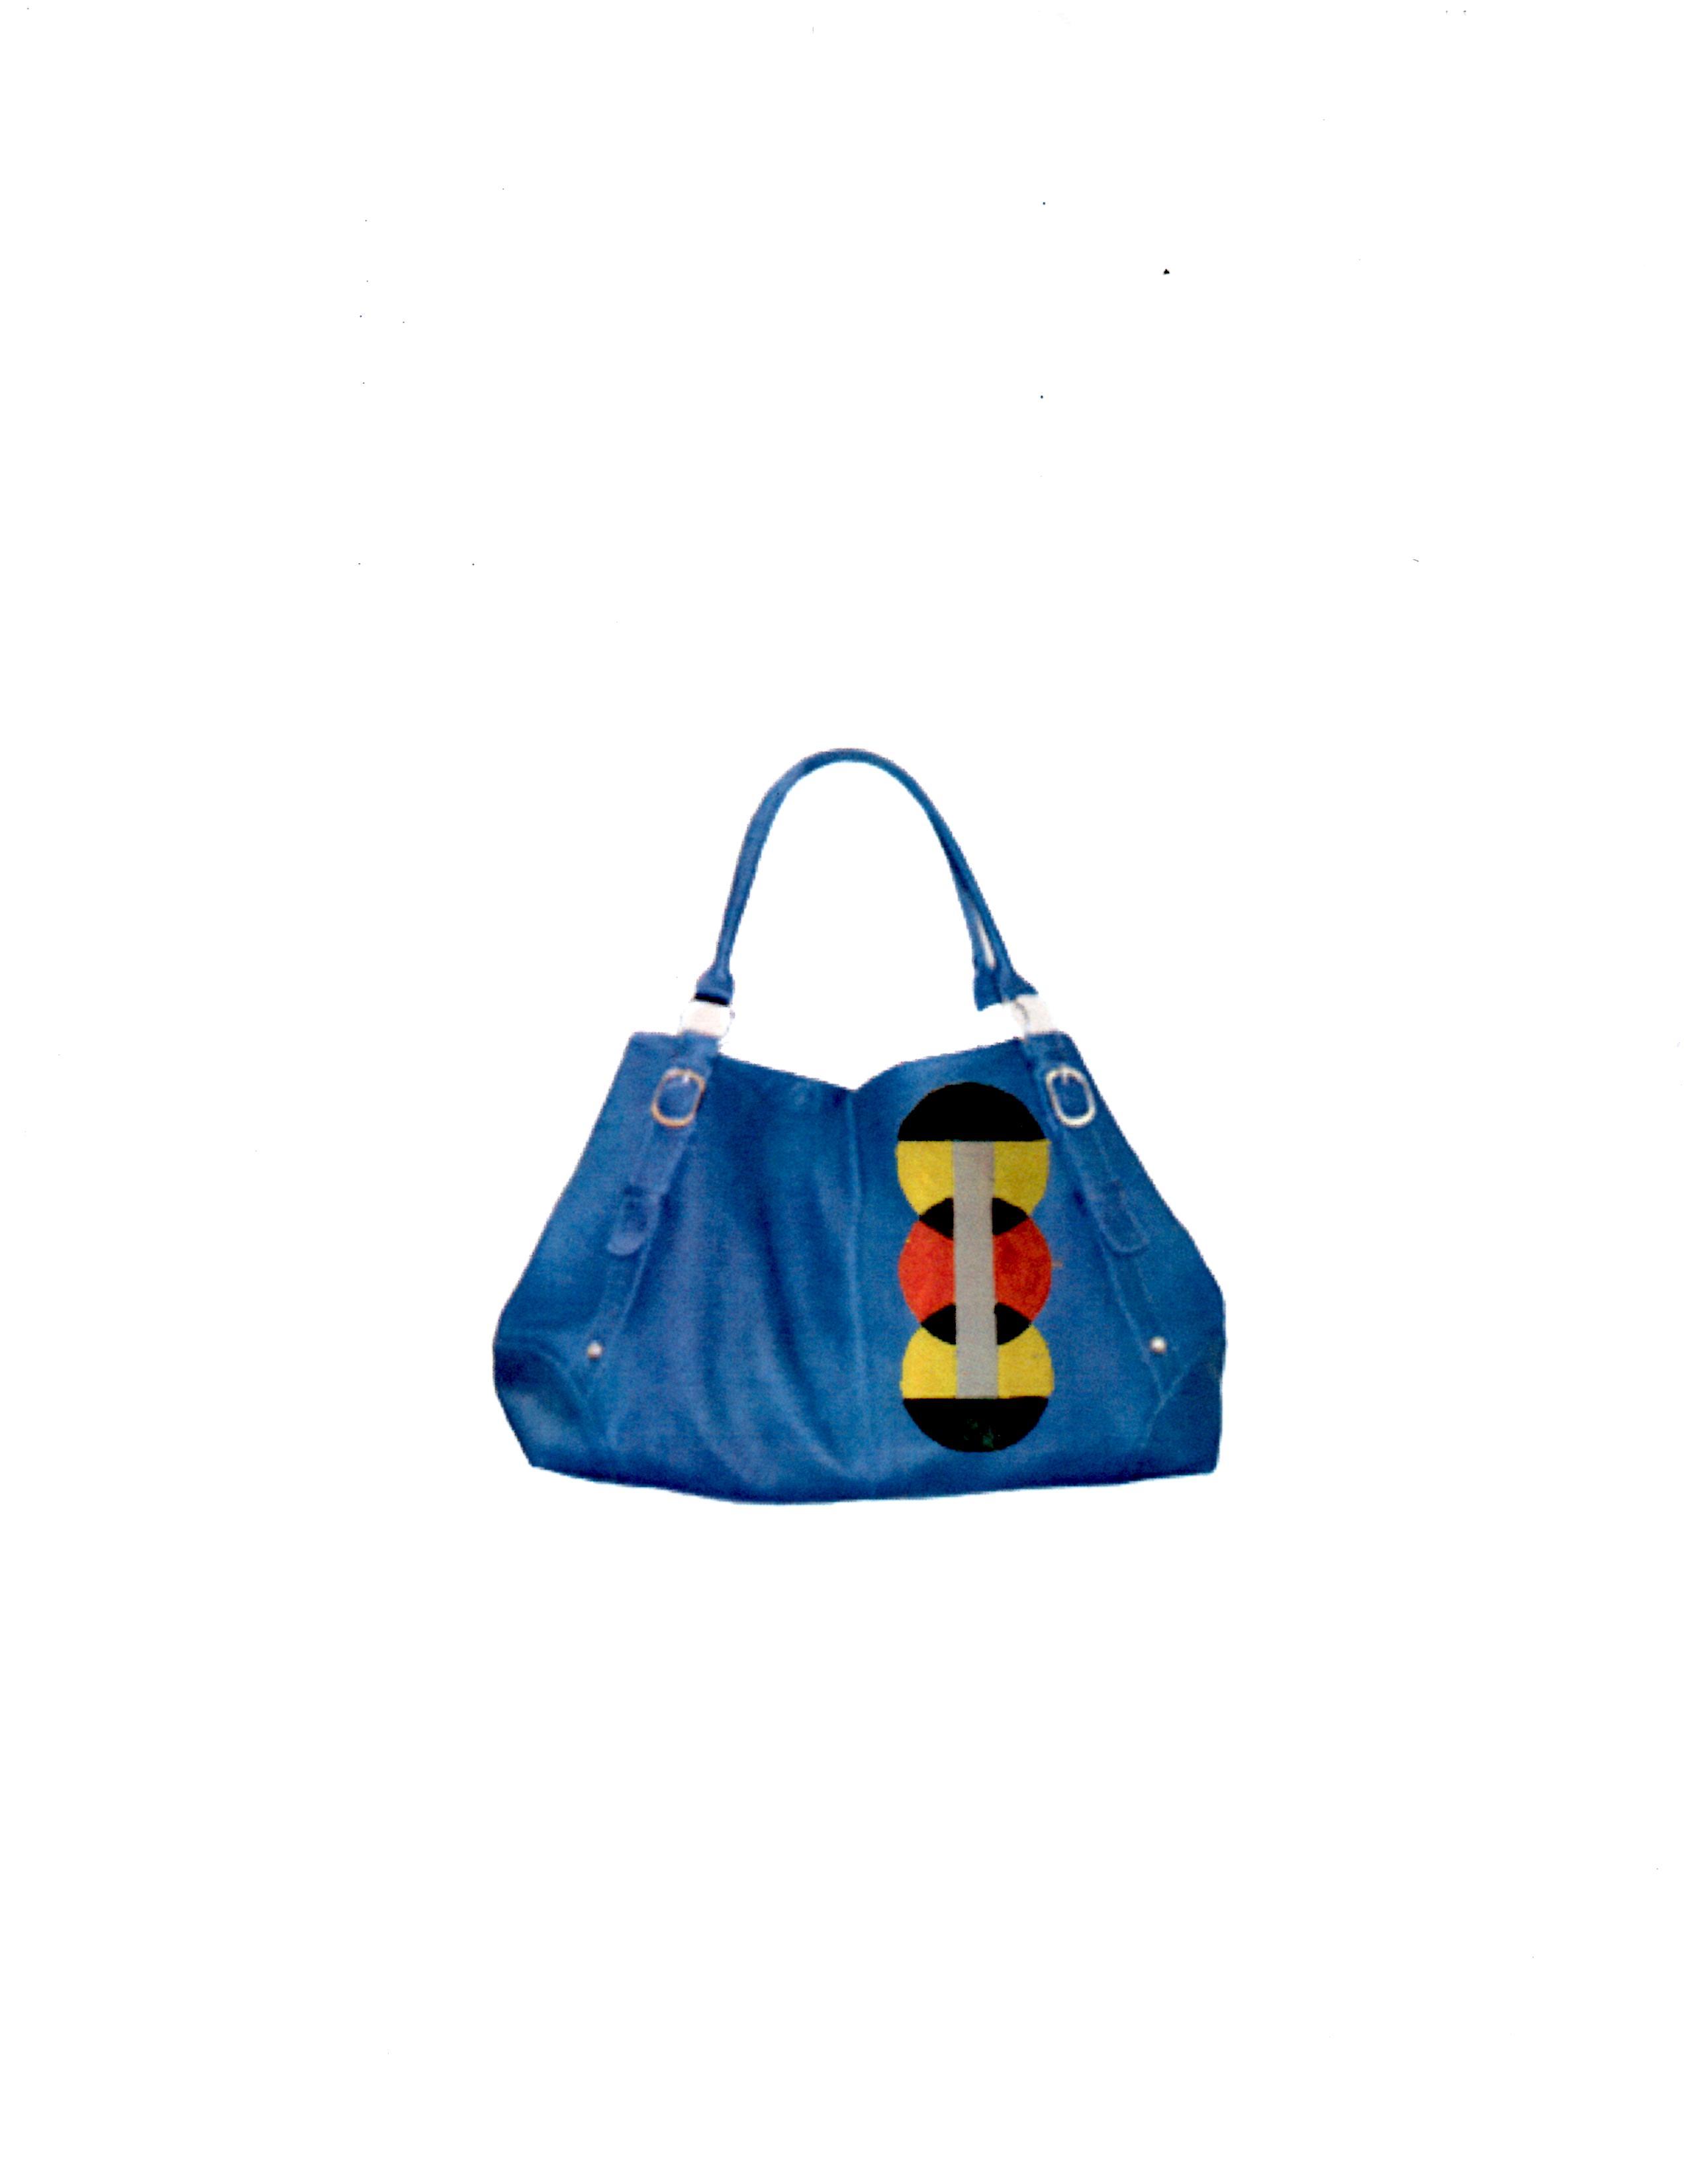 Handbag in the making